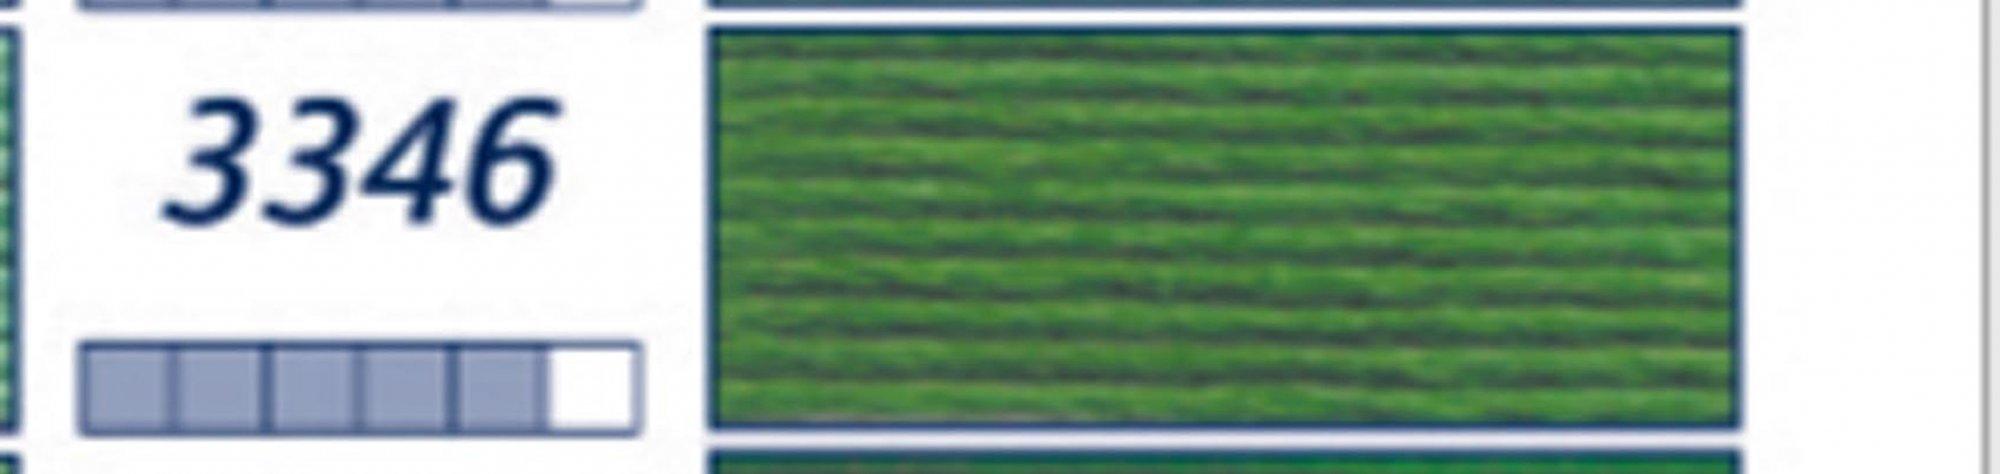 DP3-3346-HUNTER GREEN